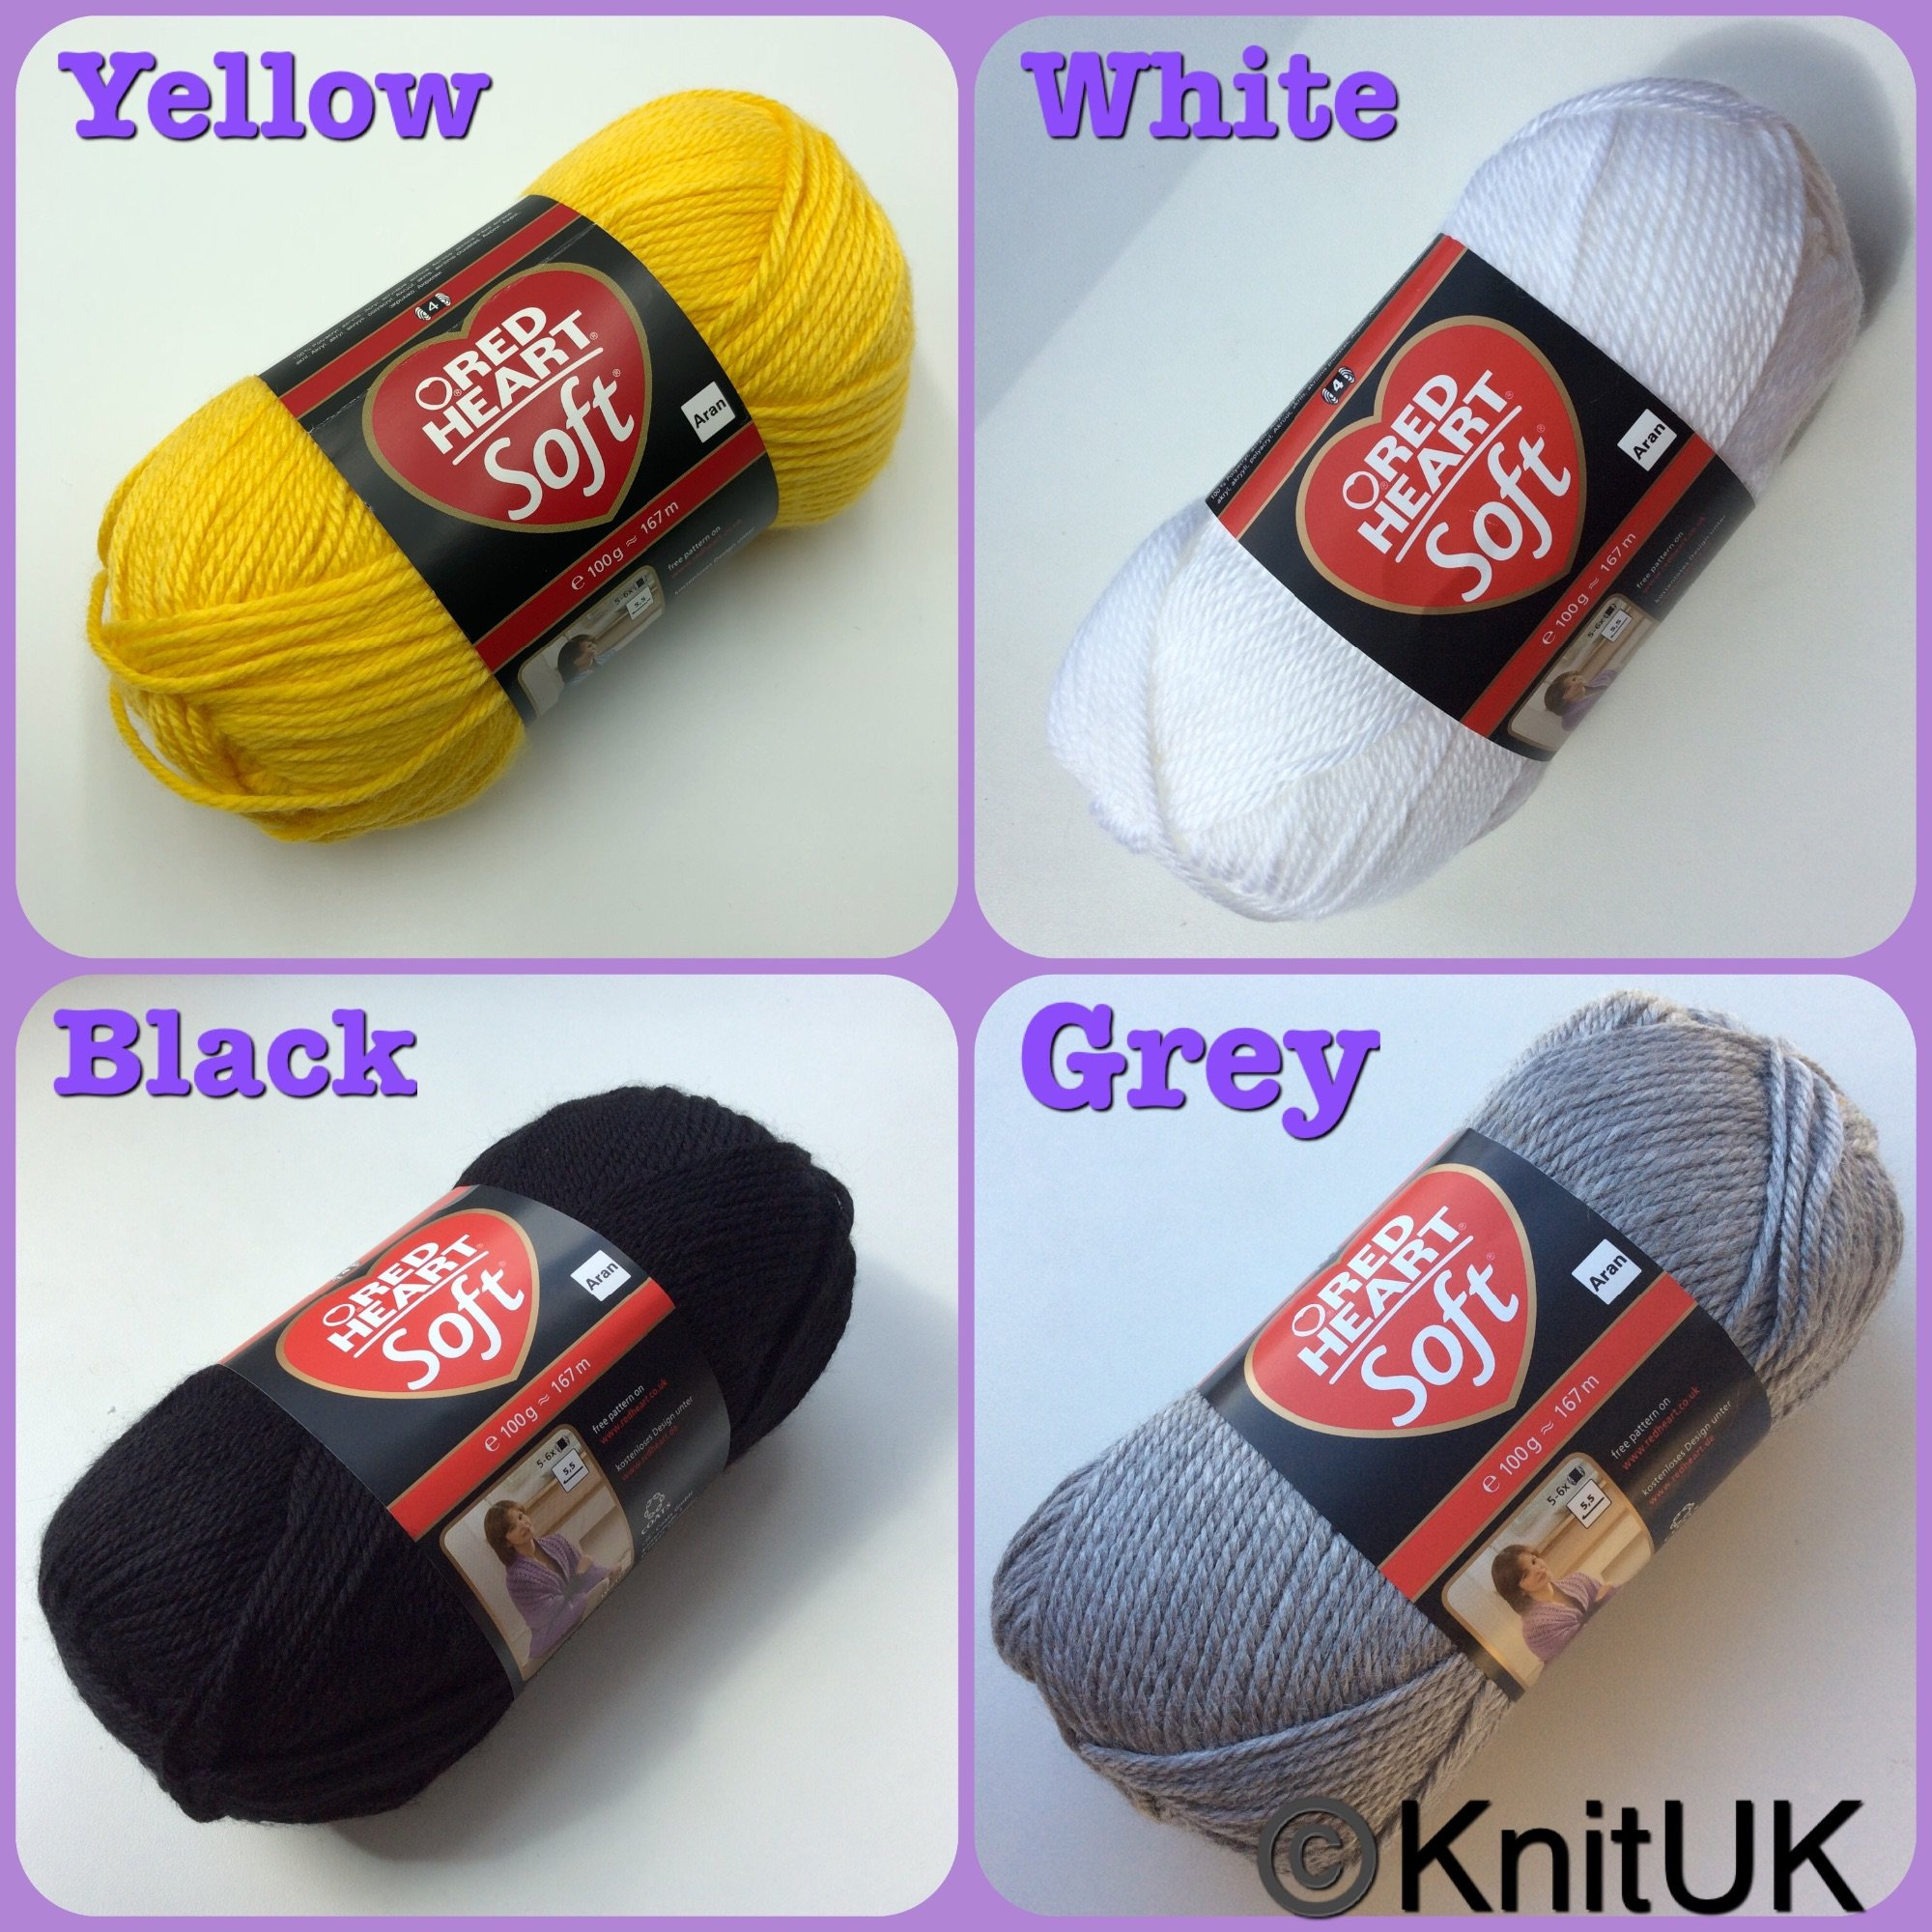 Red Heart Soft (100g)  Aran yarn for knitting and crochet